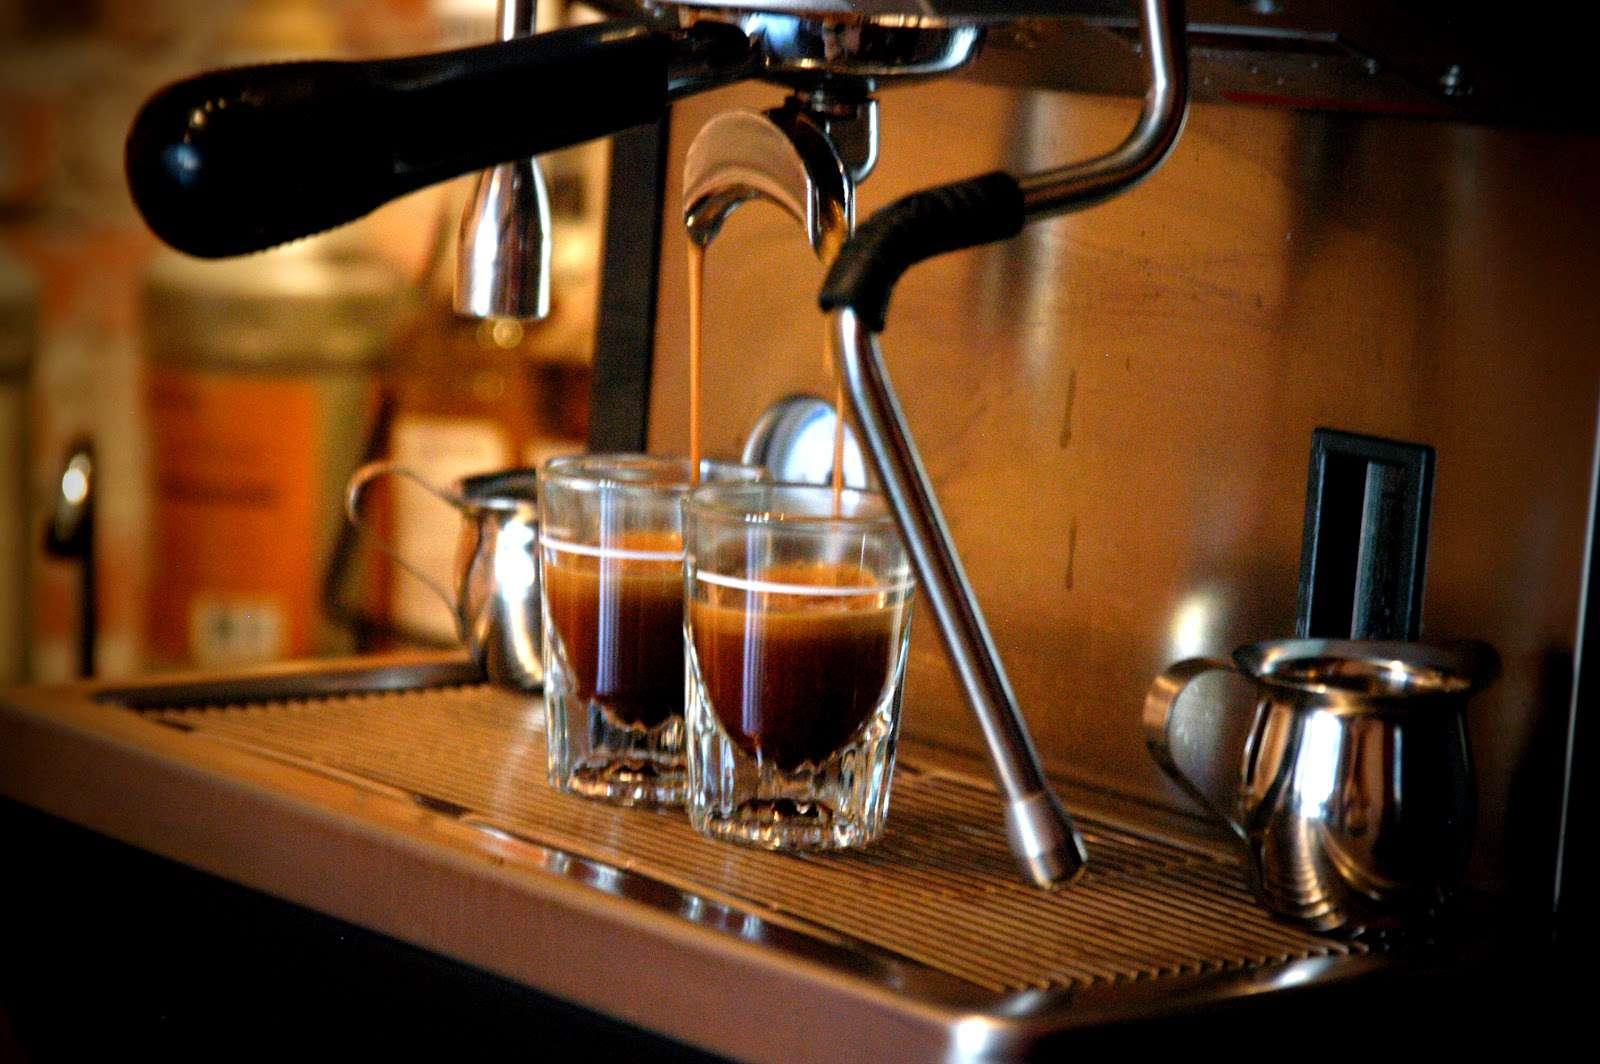 Pha chế cà phê Espresso